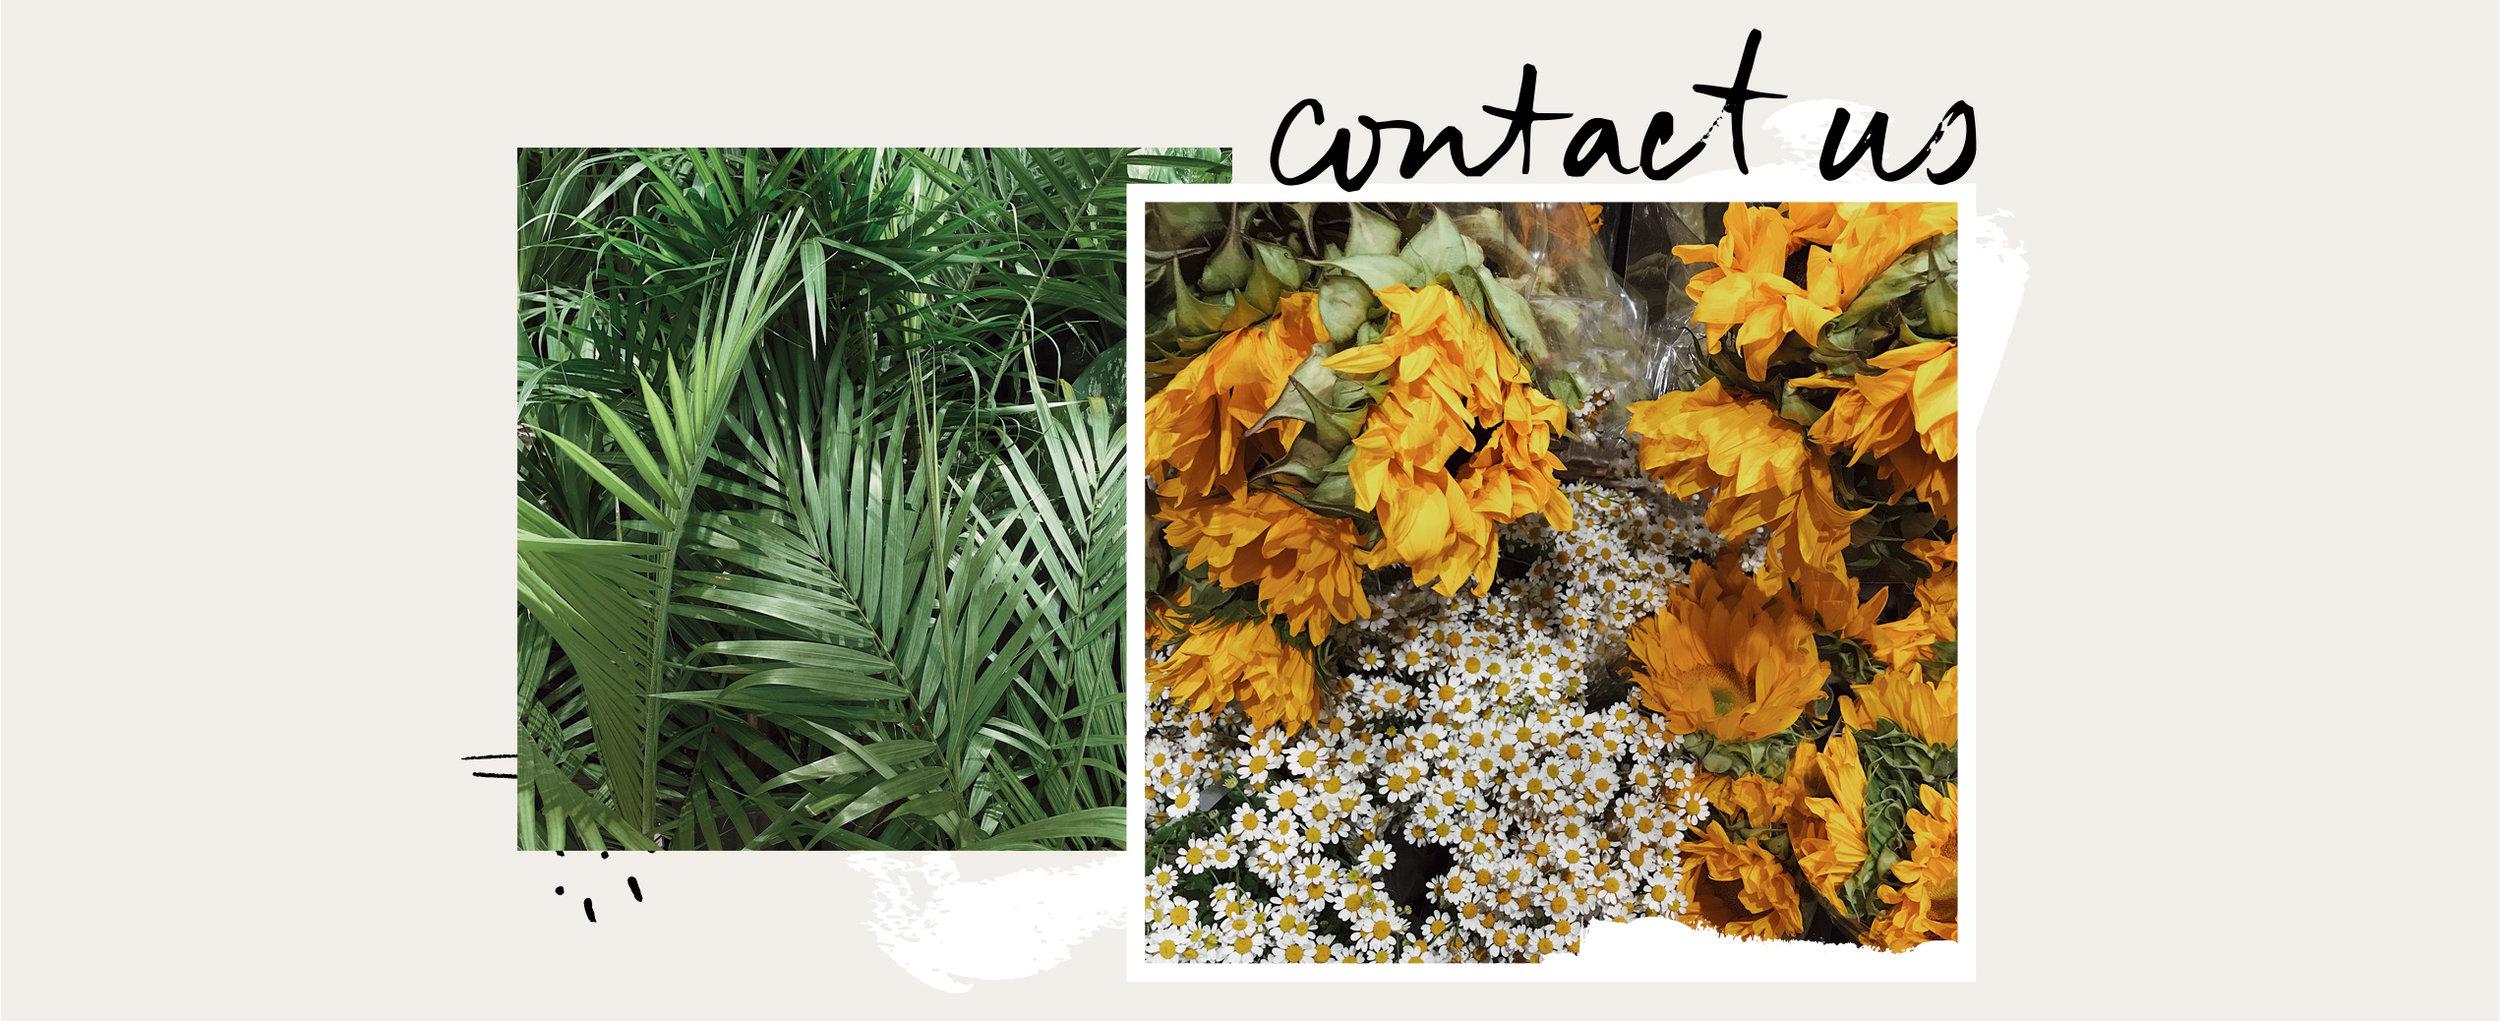 contactform2.jpg